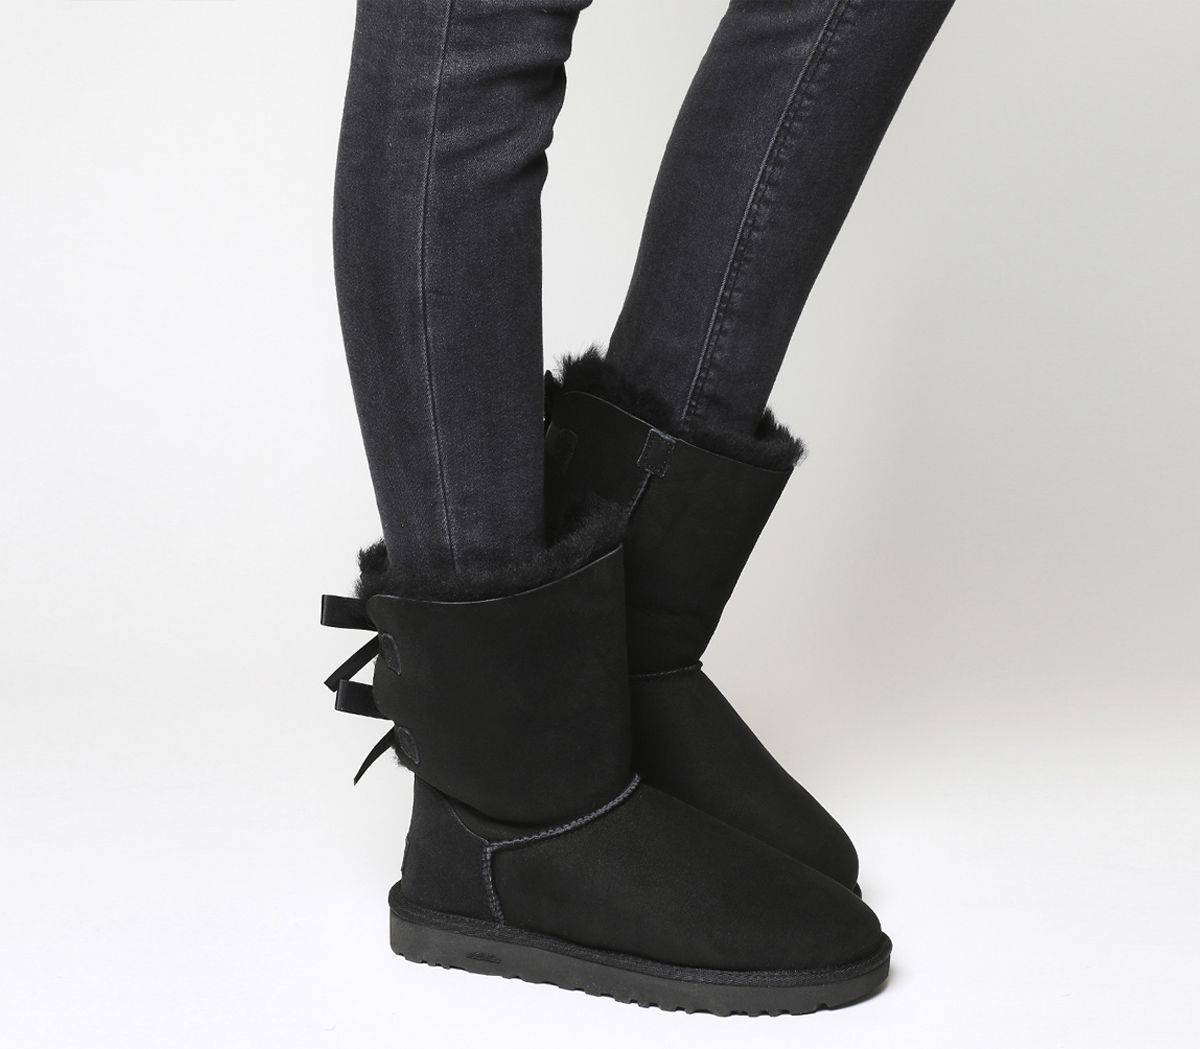 cef6871a225 Bailey Bow II Calf Boots